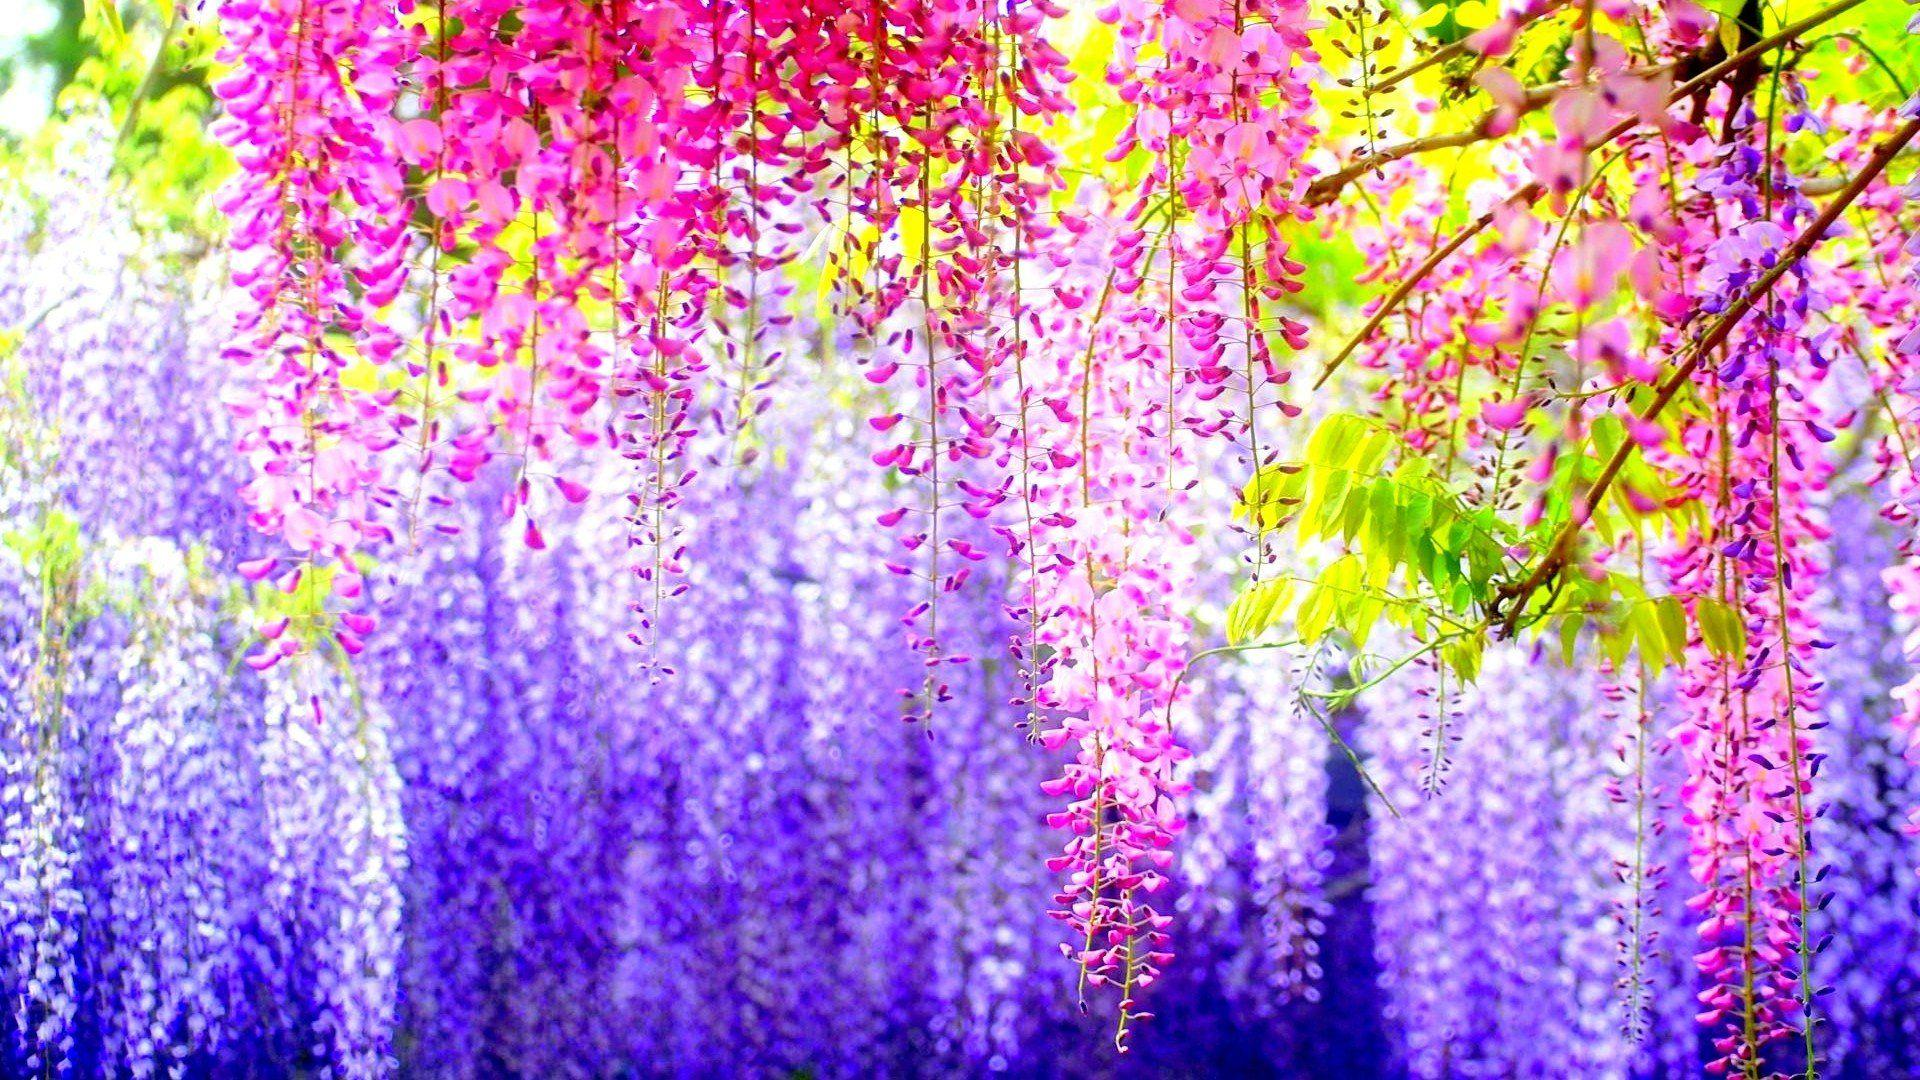 Beautiful colorful flowers wallpapers wallpaper cave most beautiful flowers wallpapers 16801050 wallpapers of beautiful izmirmasajfo